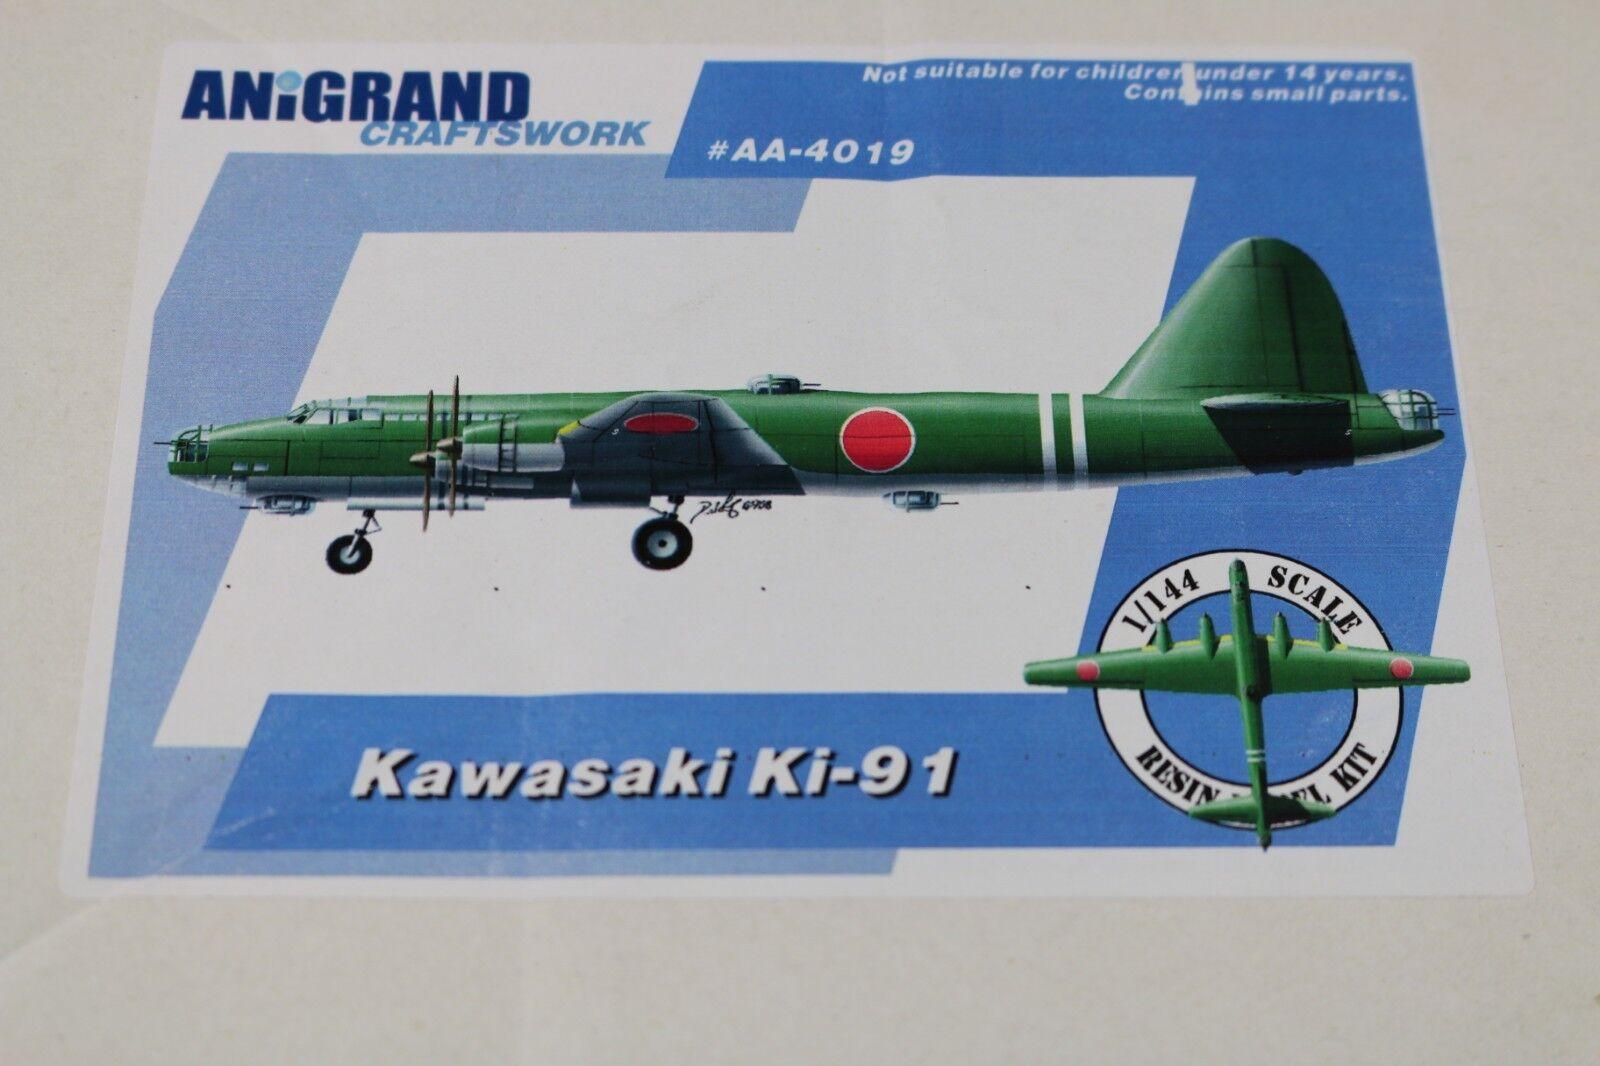 Zf1232 Anigrand Craftswork 1 144 Modelll Flugzeug Aa-4019 Kawasaki Ki-91